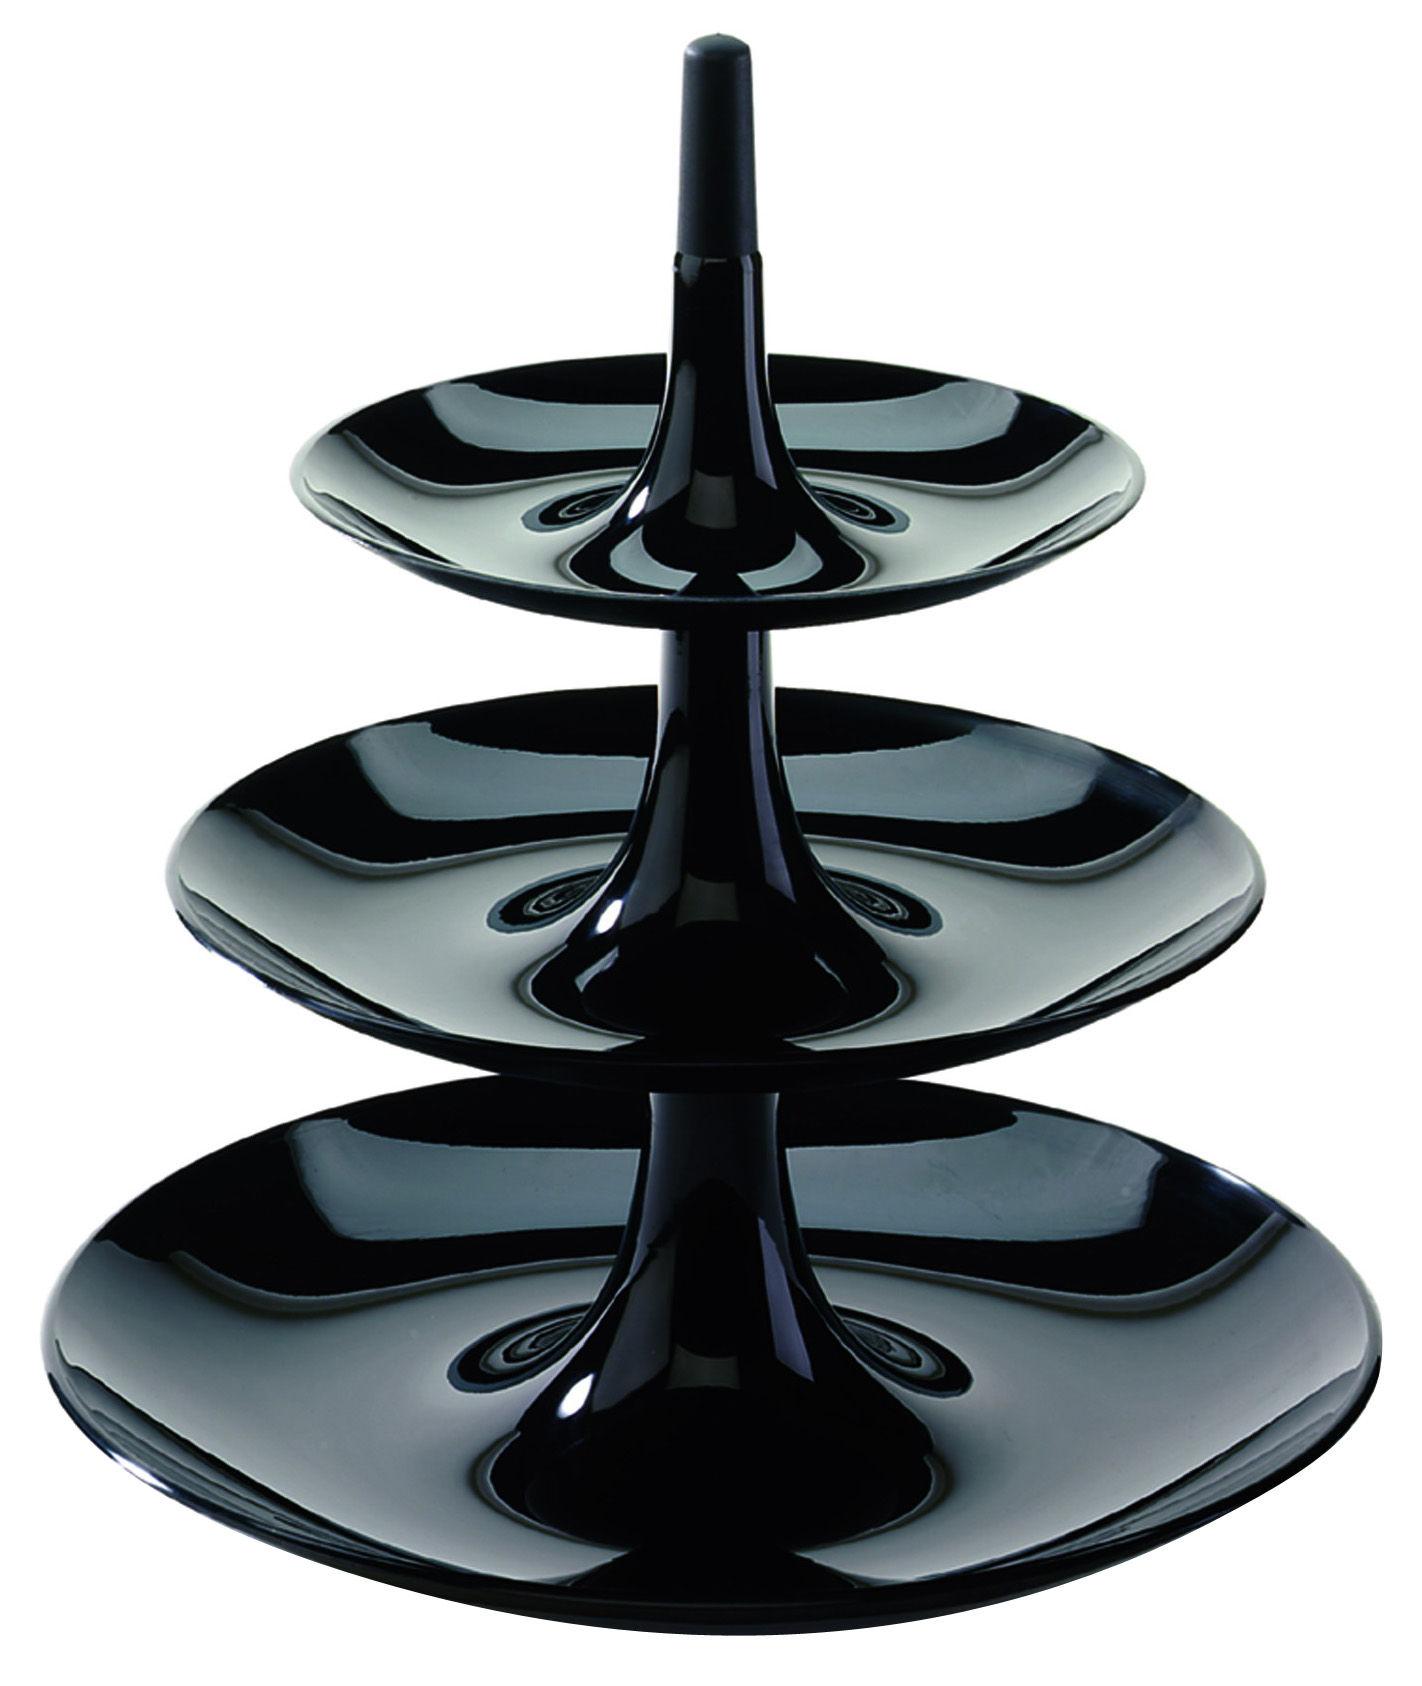 Tableware - Serving Plates - Babell Presentation dish - Ø 31,4 x H 34 cm by Koziol - Black - Polypropylene